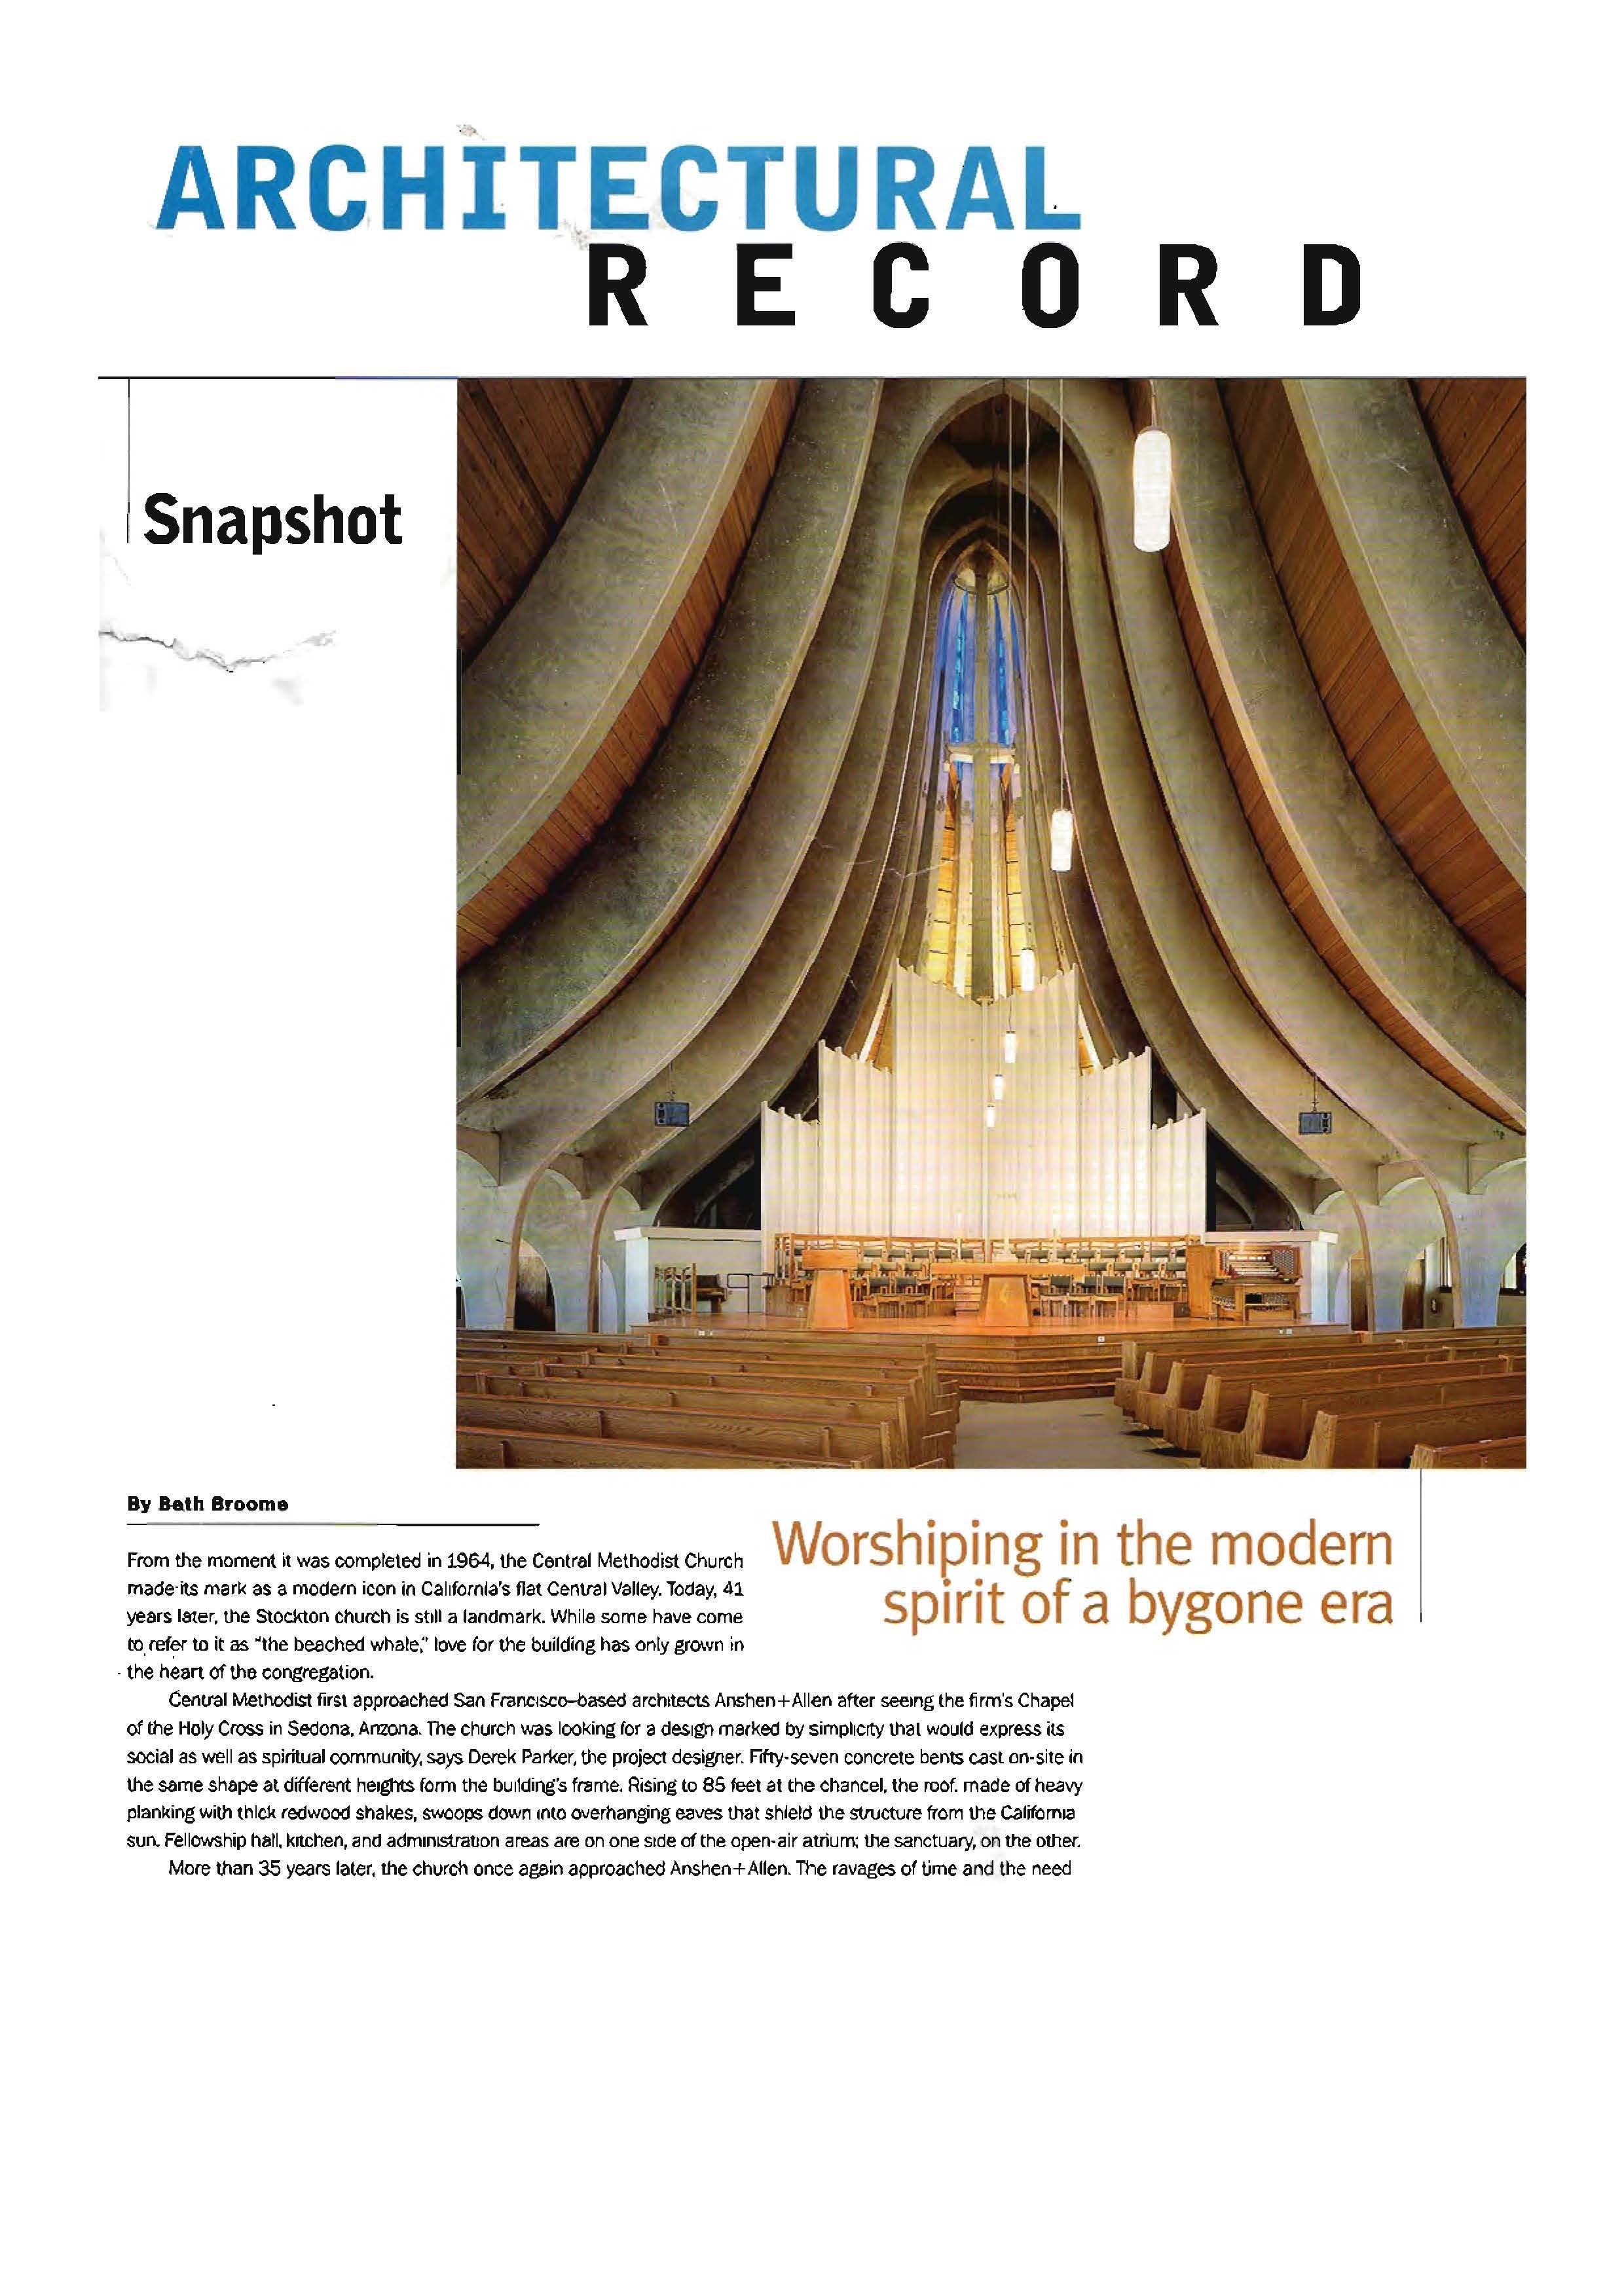 Central Methodist Church: Worshiping with a modern spirit in a bygone era